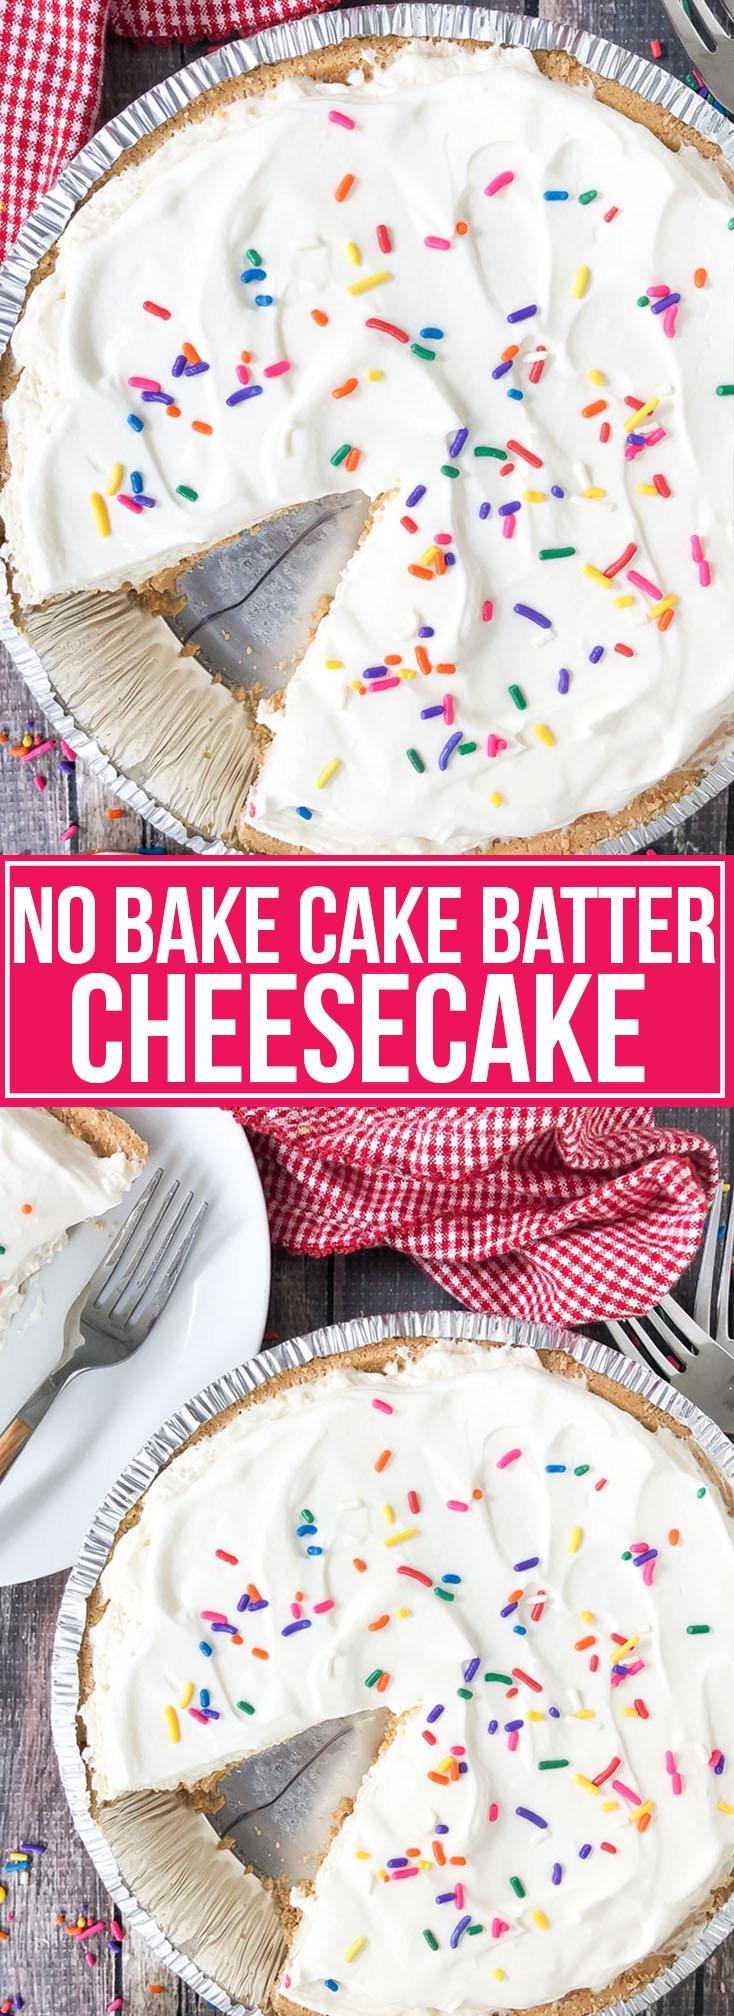 NO BAKE CAKE BATTER CHEESECAKE